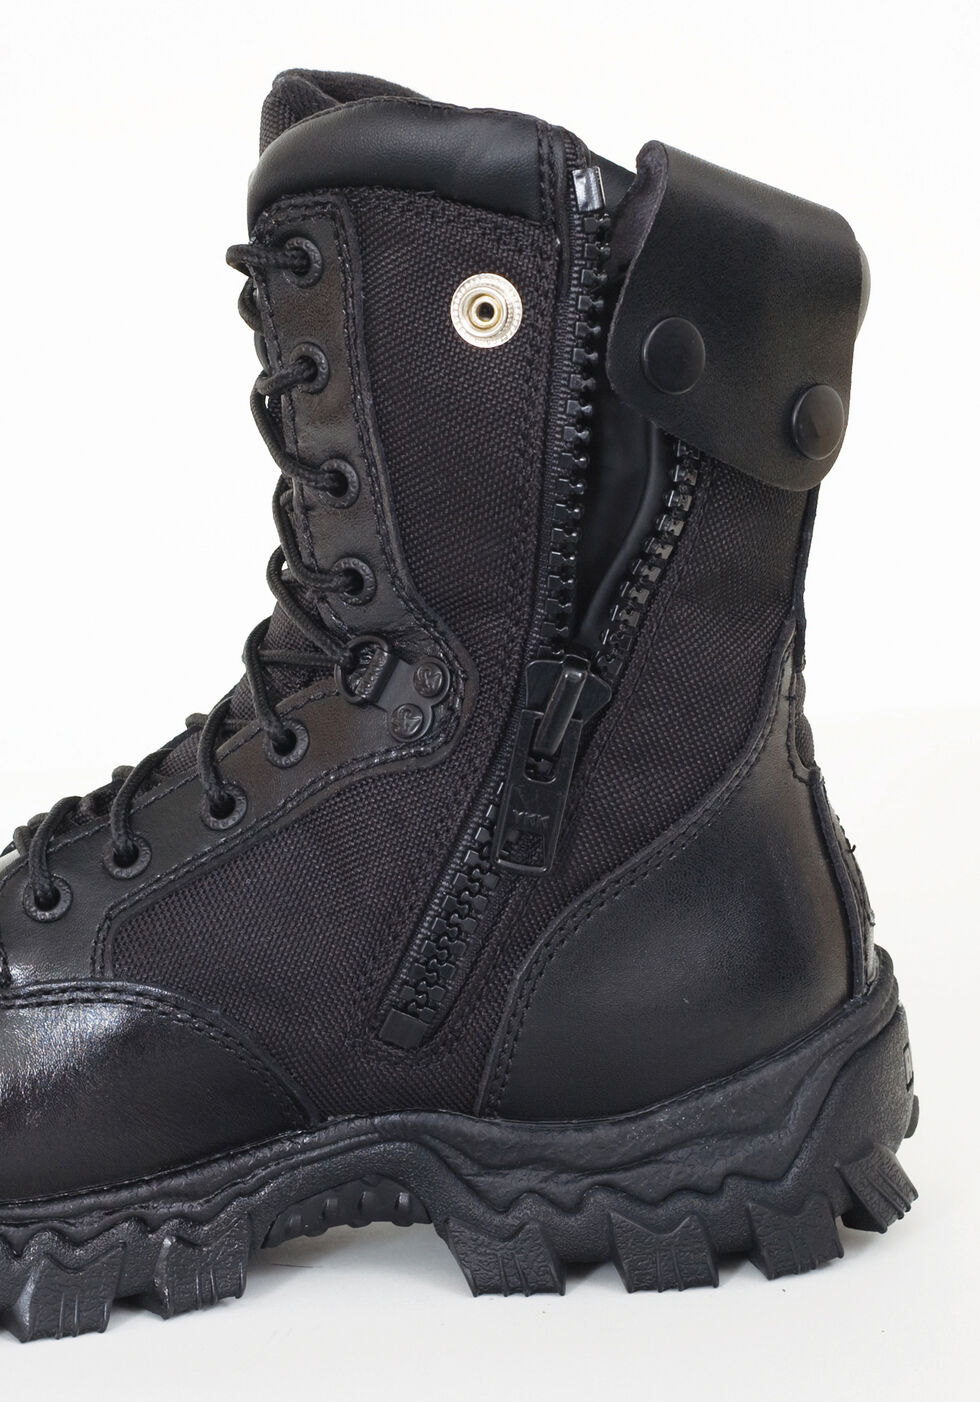 Rocky Men's Alphaforce Waterproof Zipper Composite Toe Duty Boots, Black, hi-res